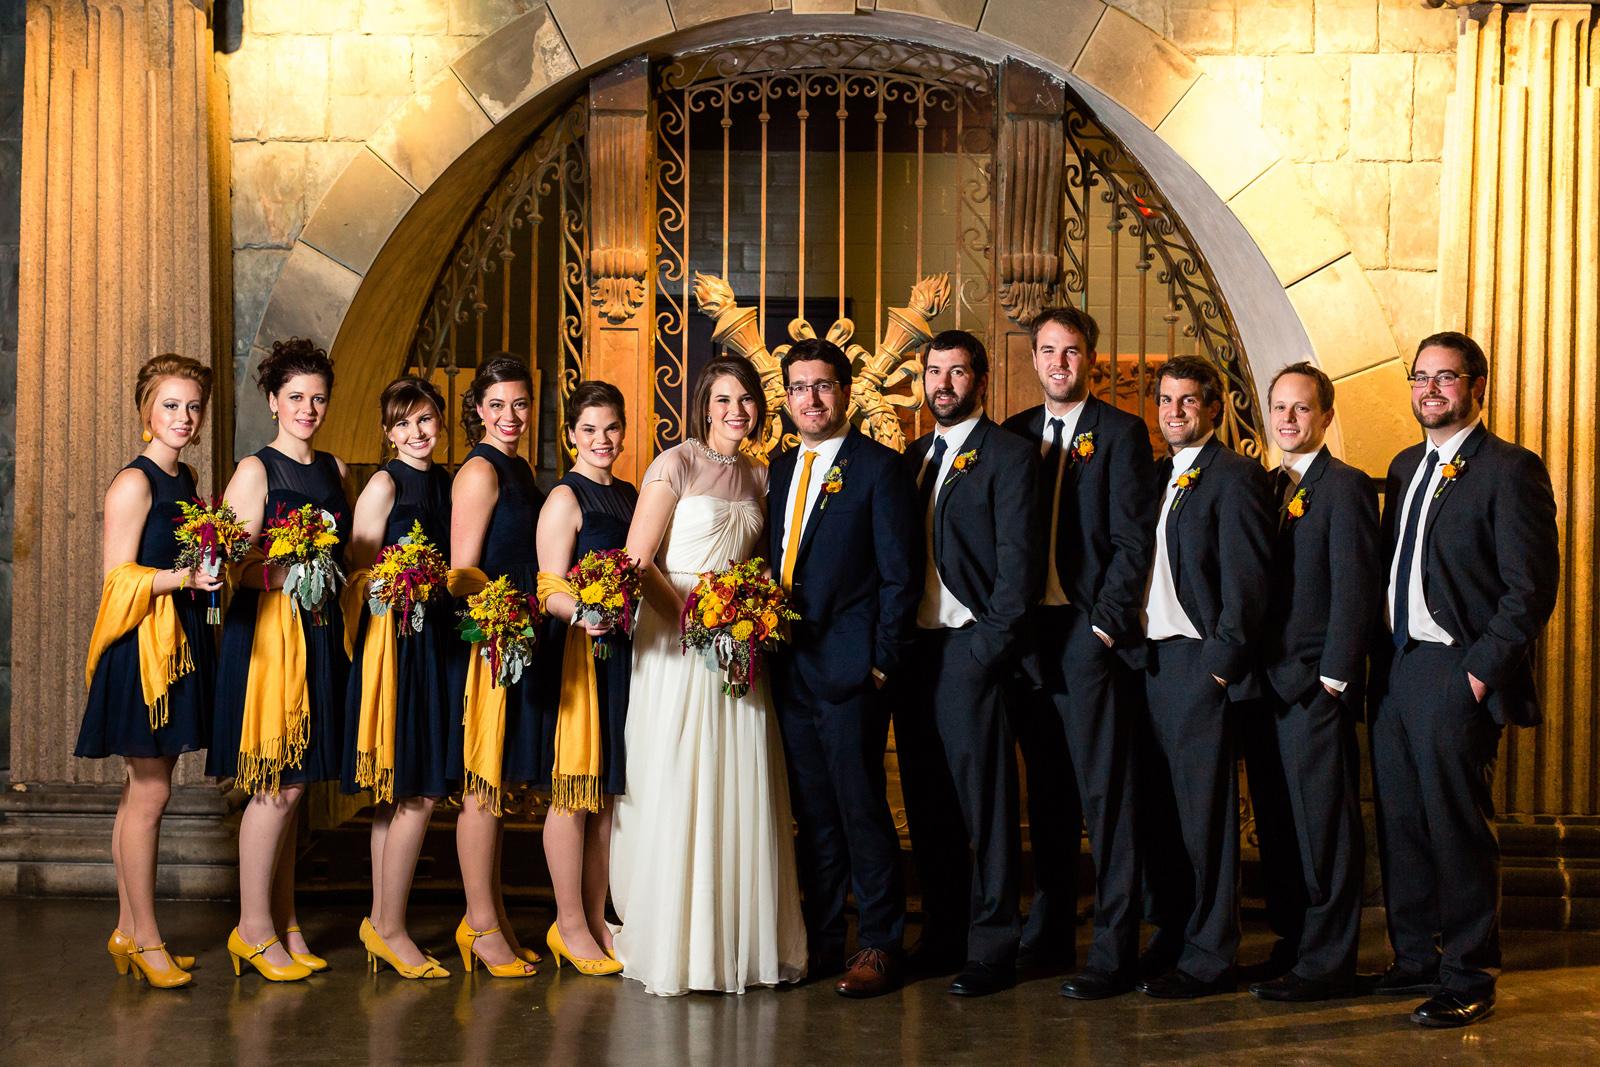 Oldani Photography-St Louis-Wedding Photos-wedding photographer-wedding party-City Museum_20141122_16354800.jpg